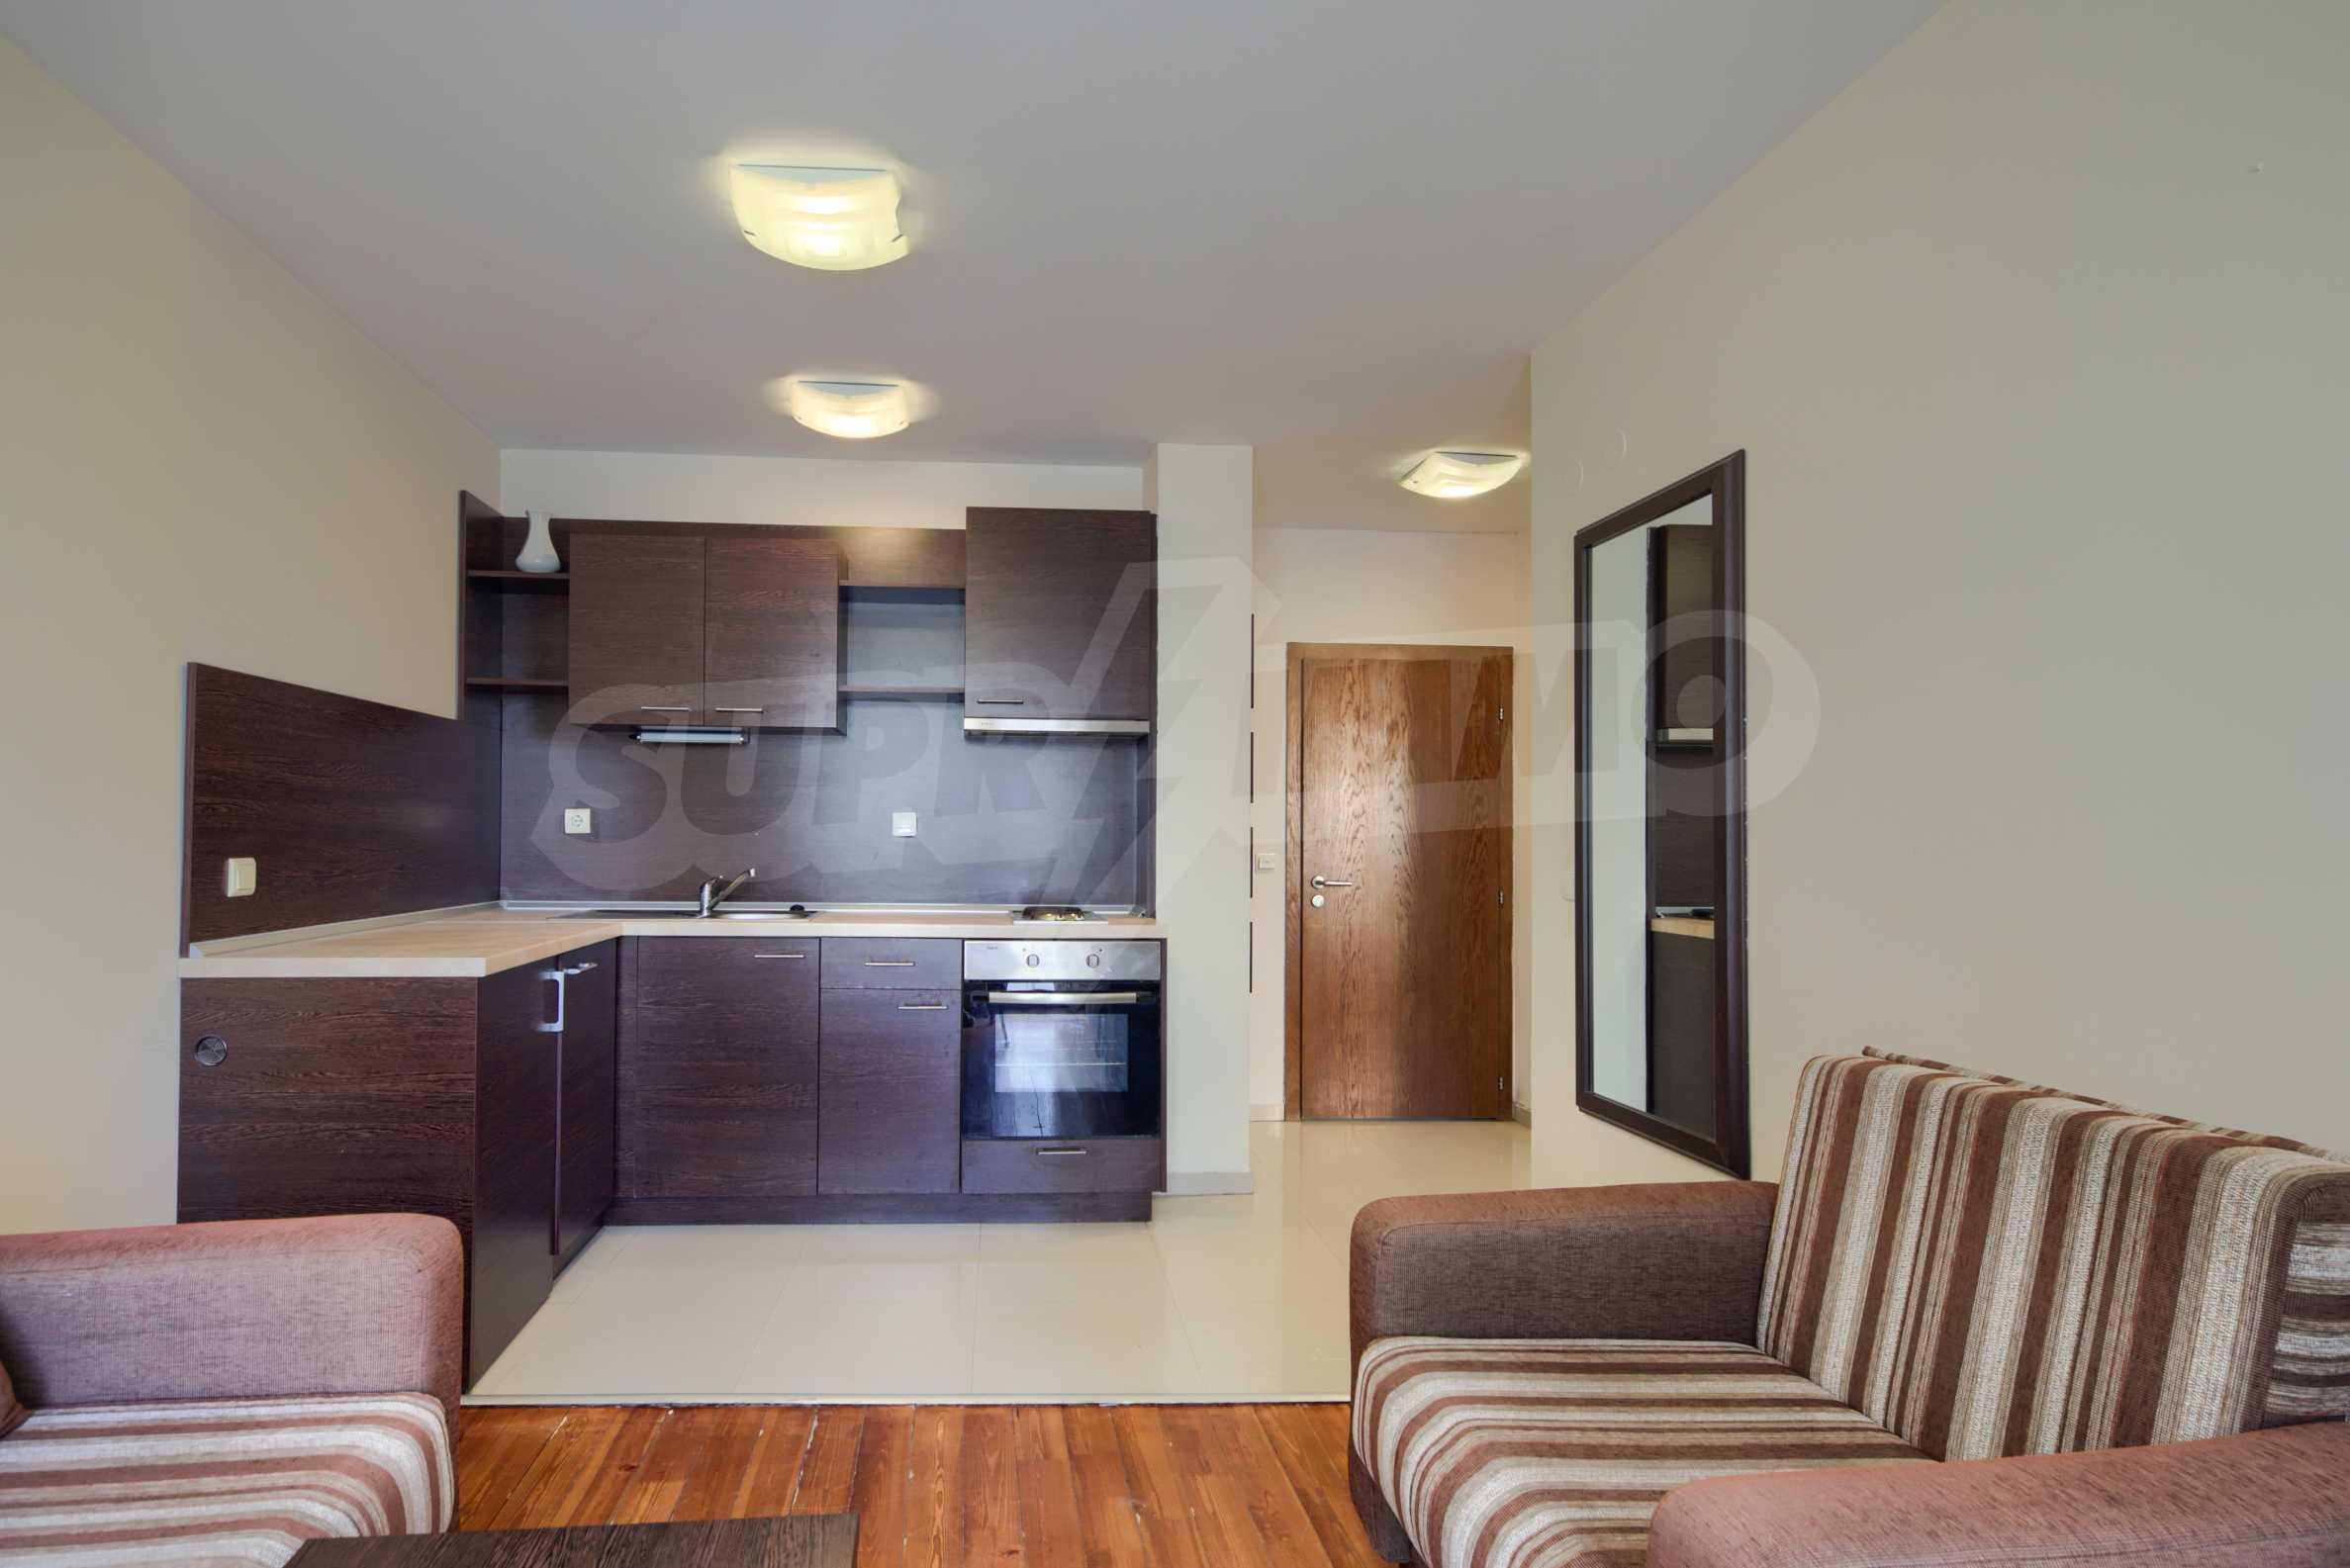 Двустаен апартамент за продажба в гр. Банско